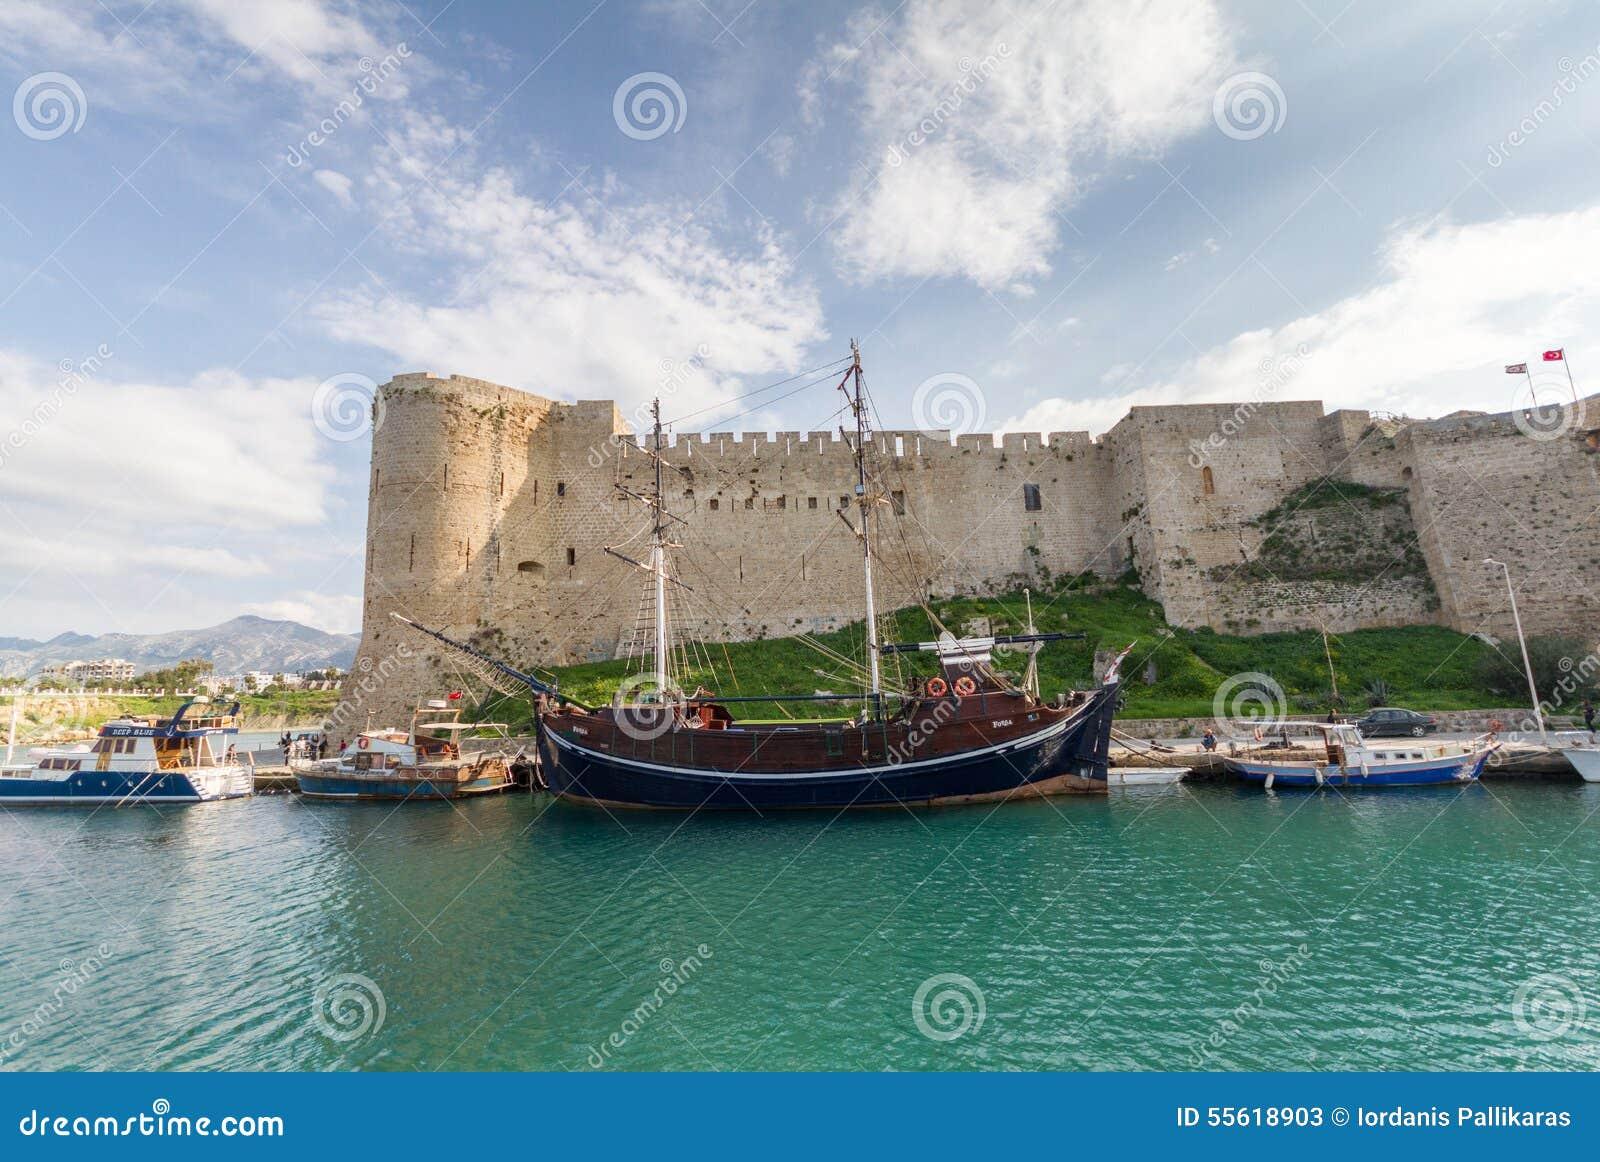 Historic 7th century AD Castle in the old Kyrenia Harbor, Cyprus